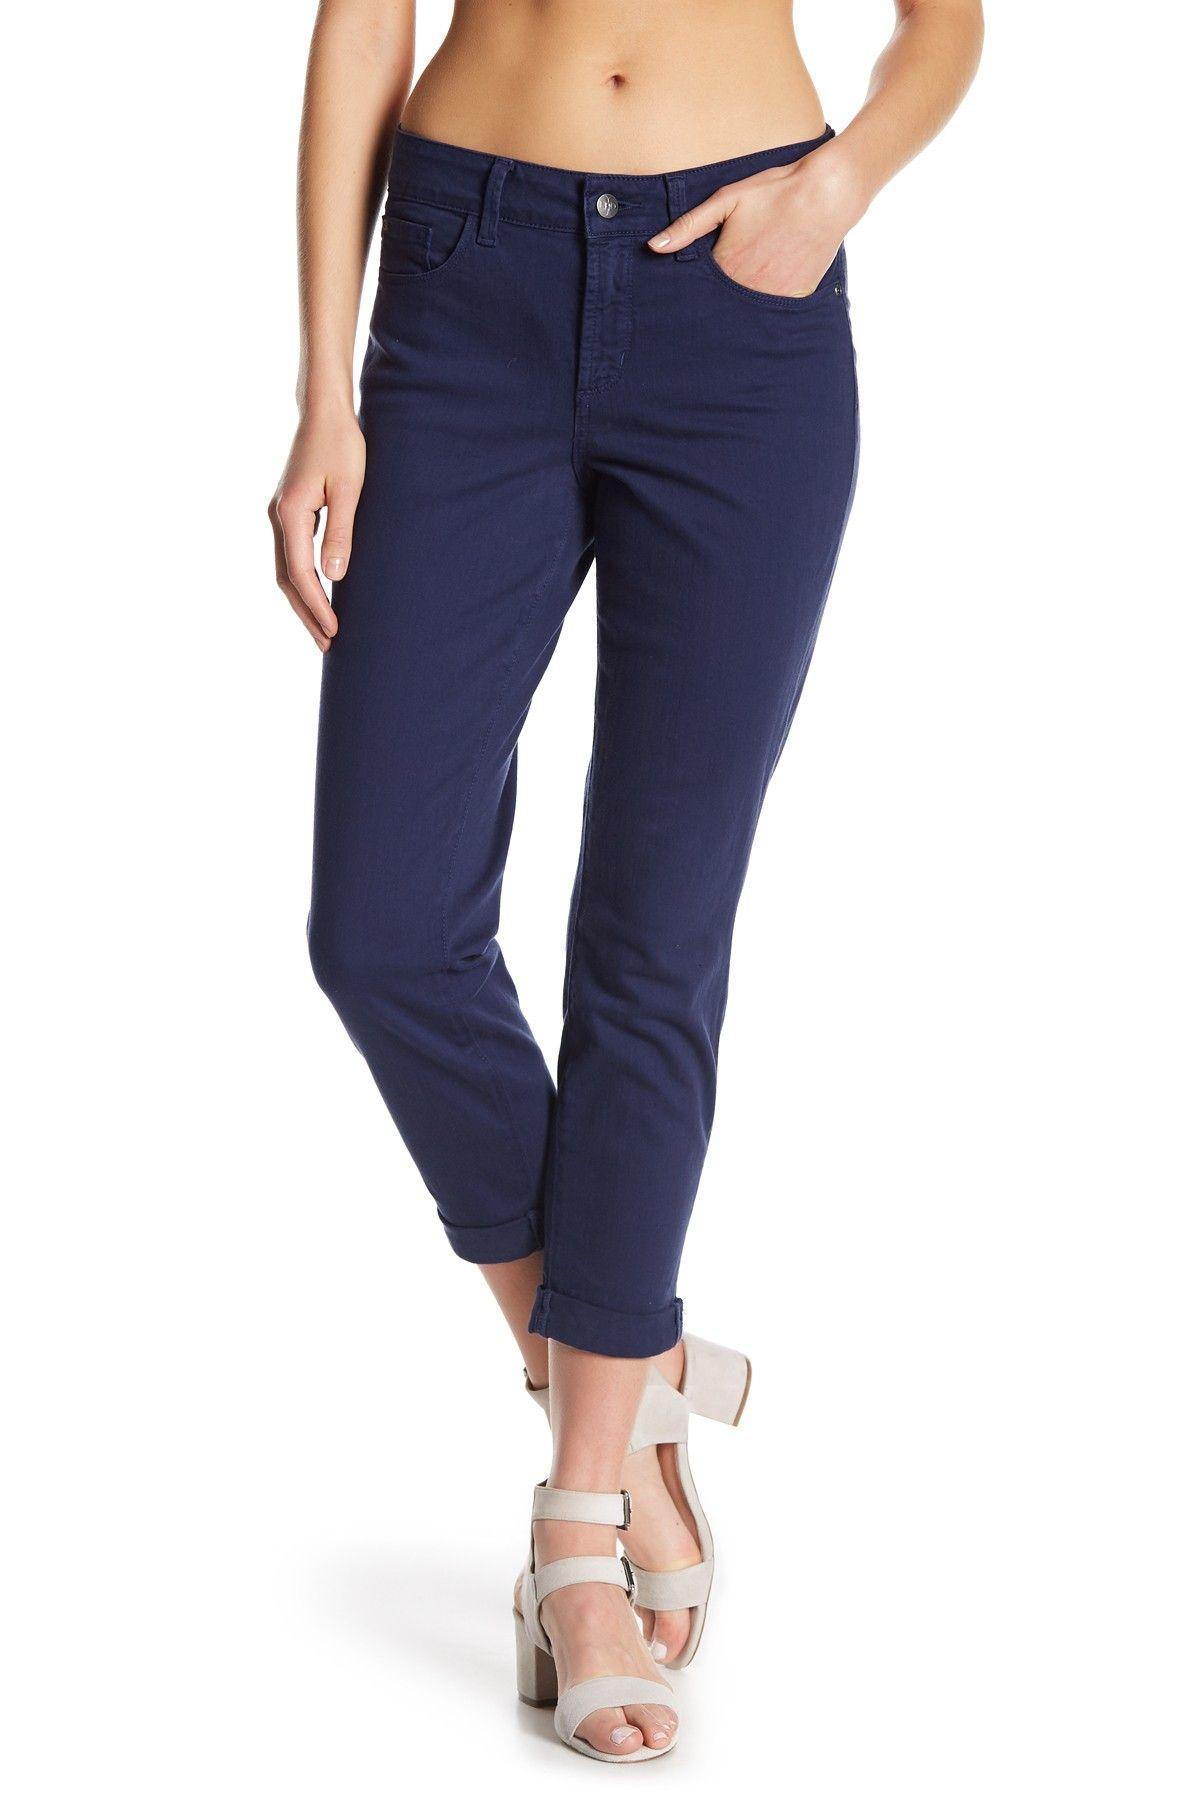 Nydj Alina Convertible Ankle Jeans Regular Petite Nordstrom Rack Casual Dresses